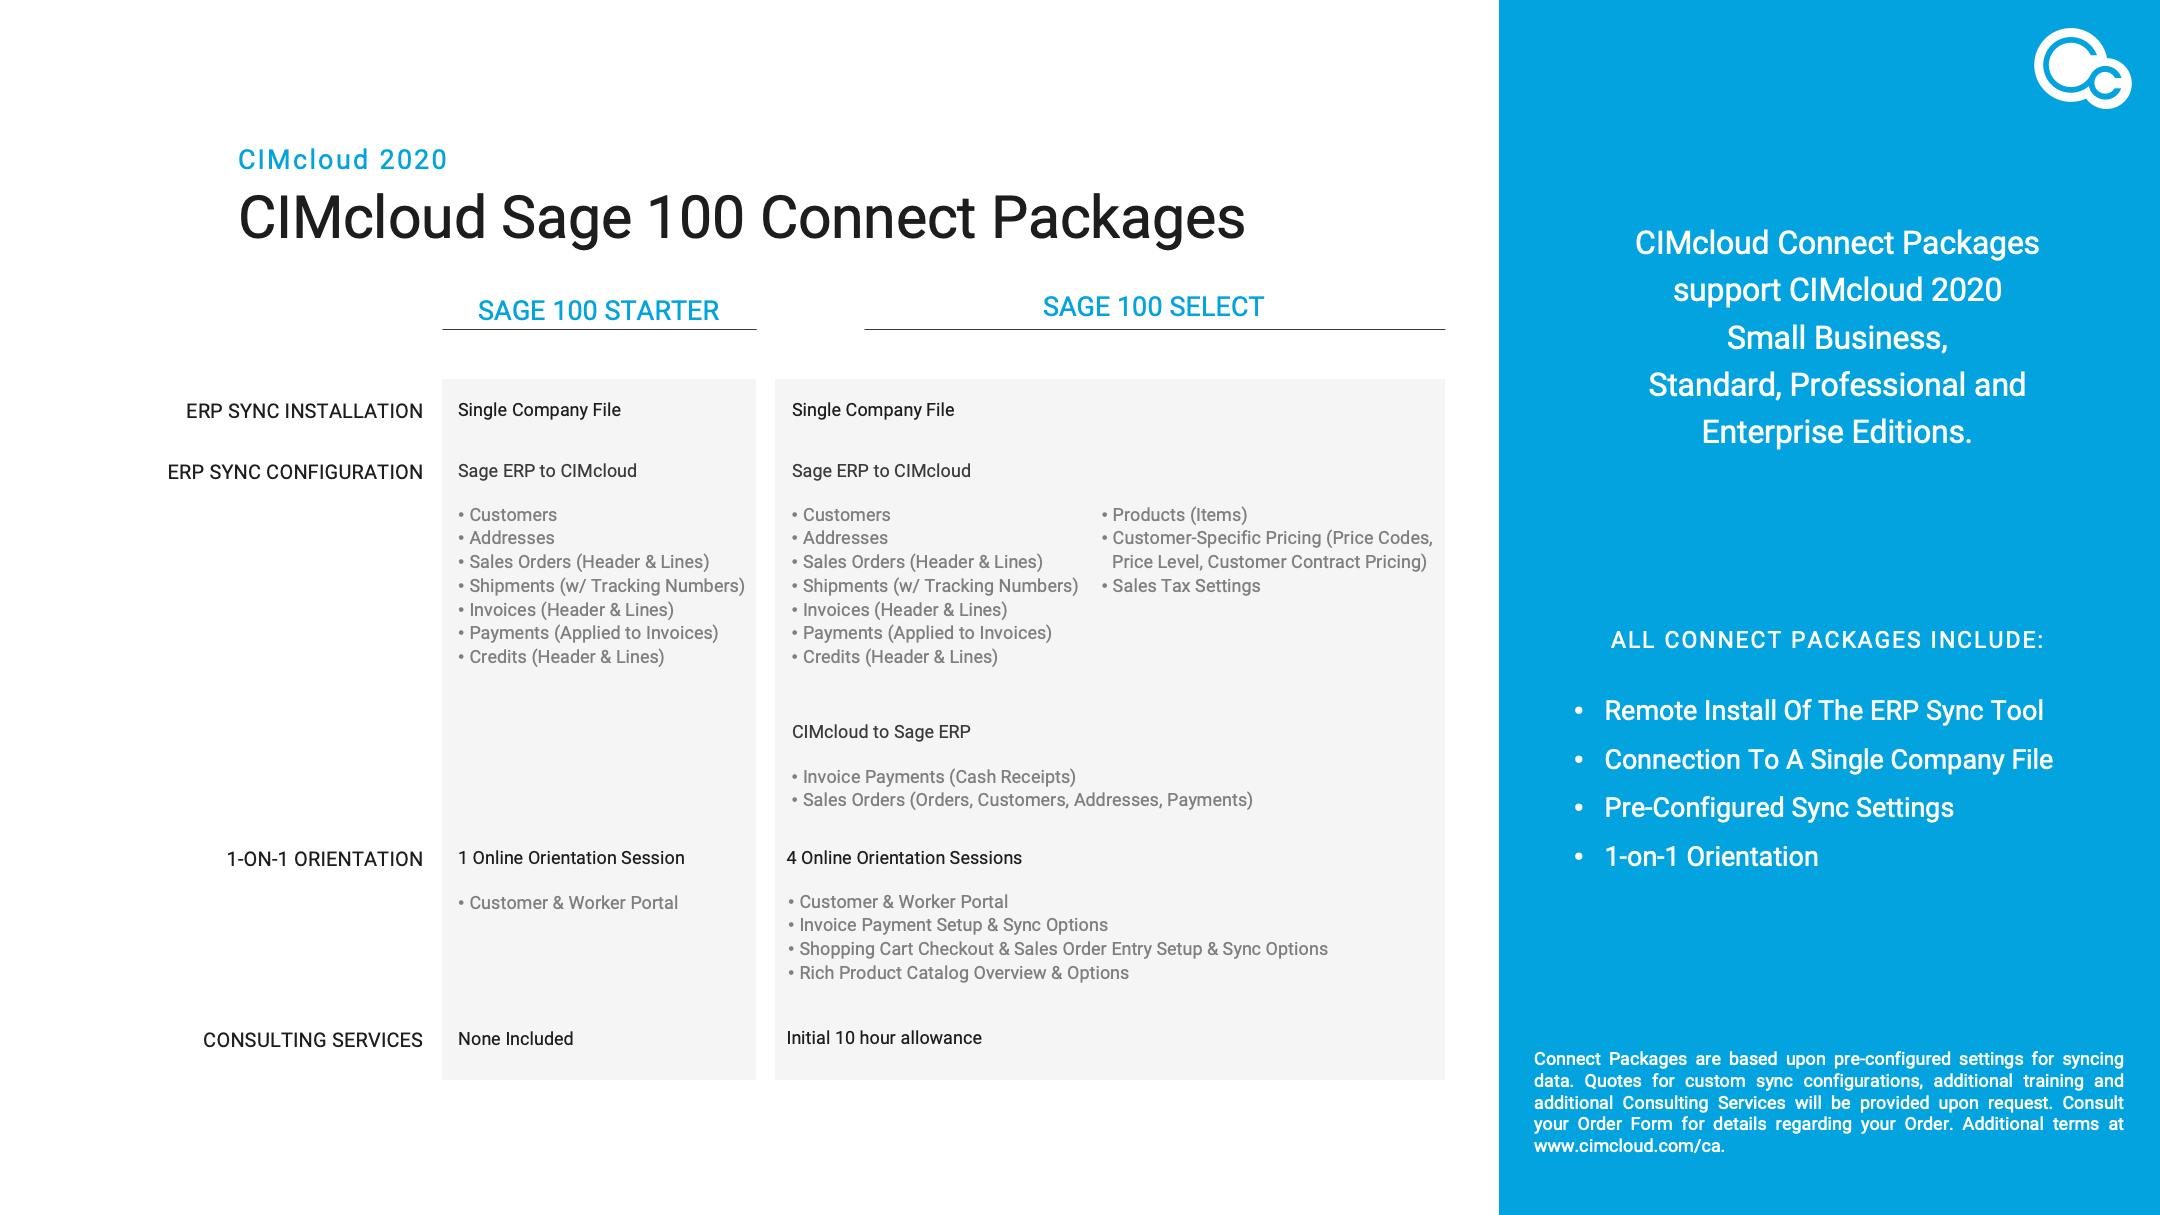 CIMcloud CAREs Connect Packages - Thumbnail